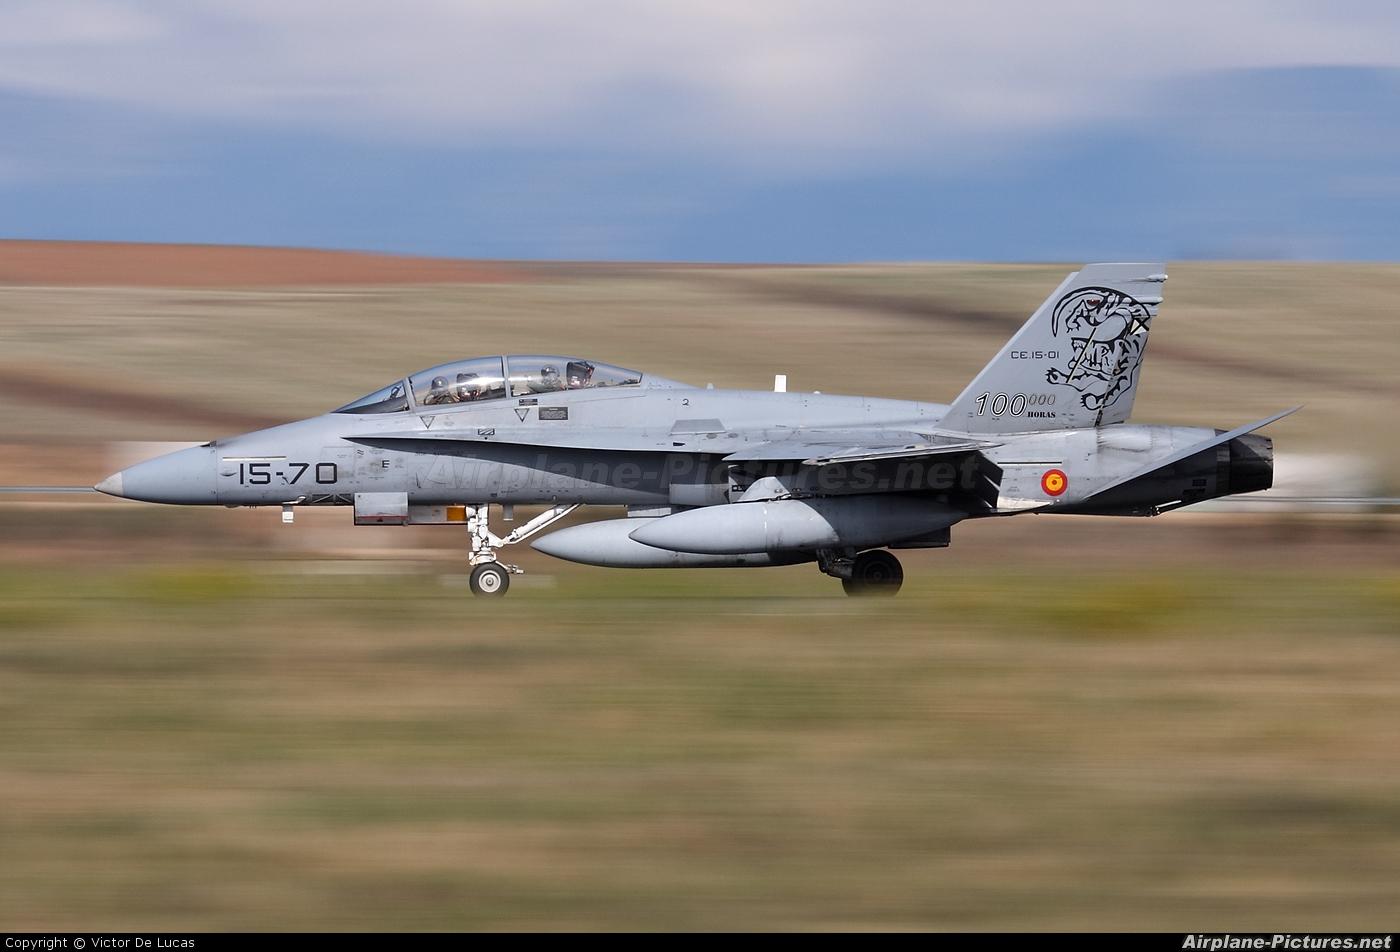 Spain - Air Force CE.15-01 aircraft at Madrid - Torrejon